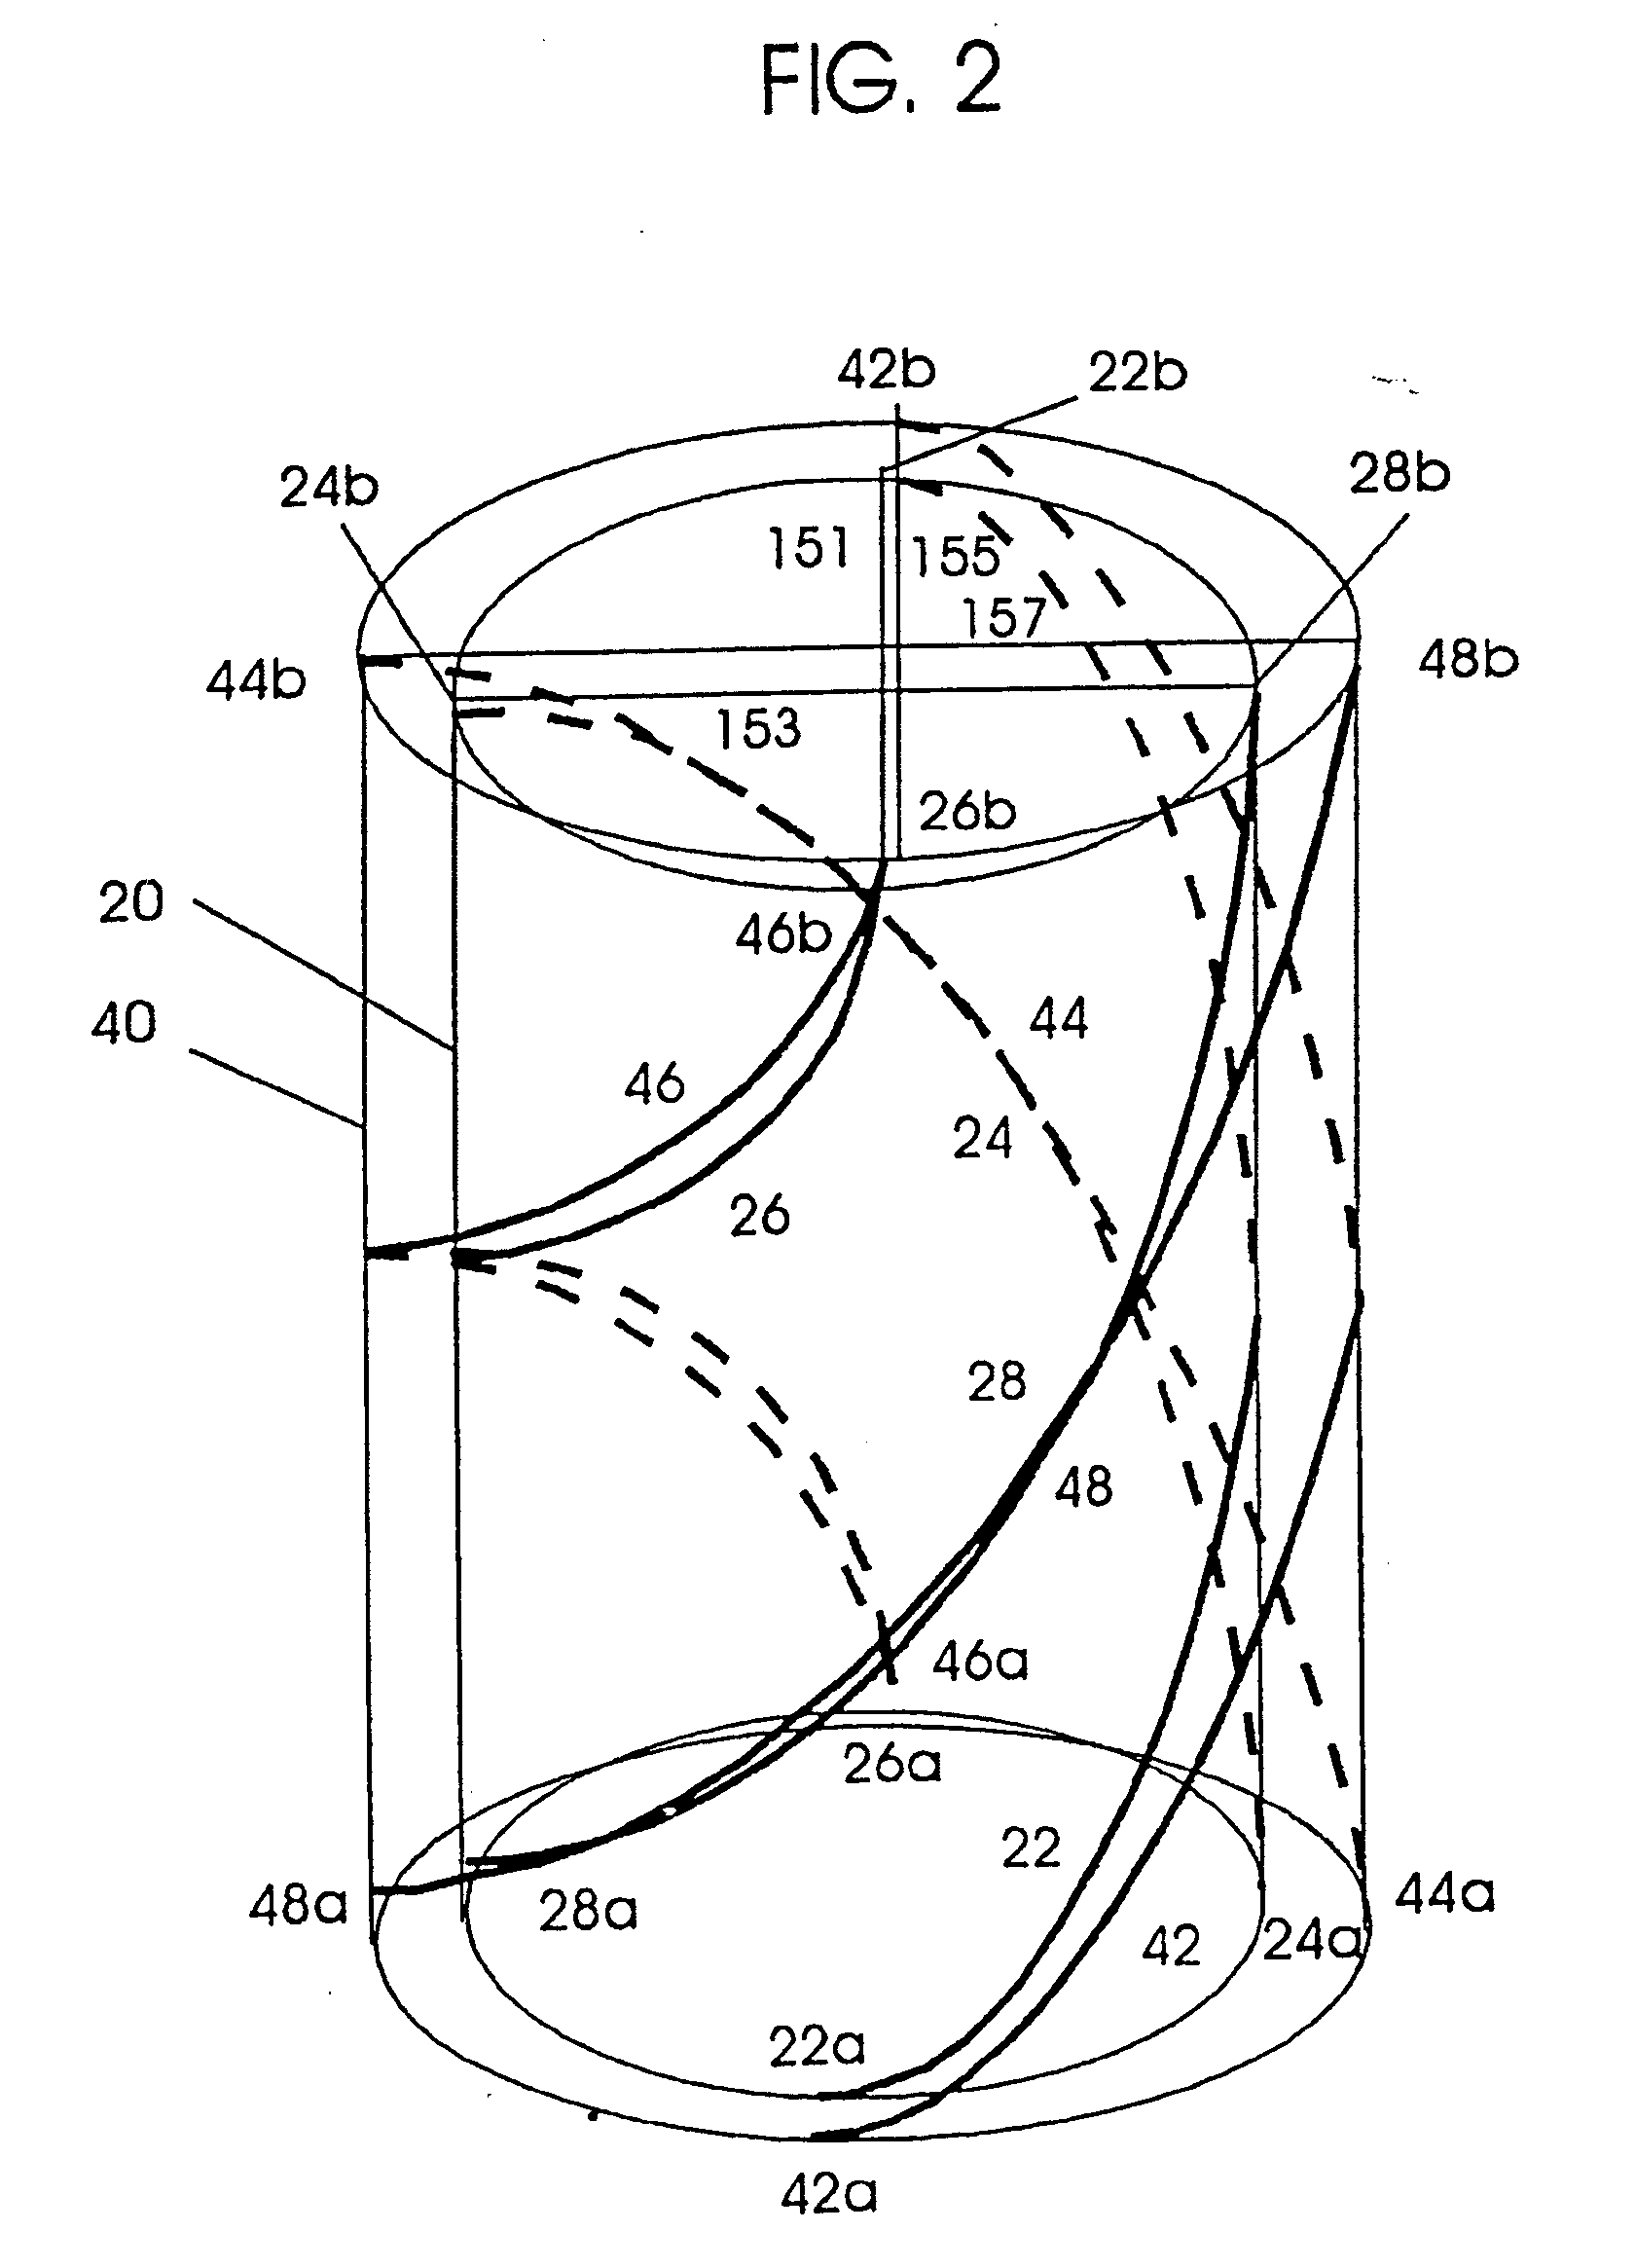 23cm Helical Antenna